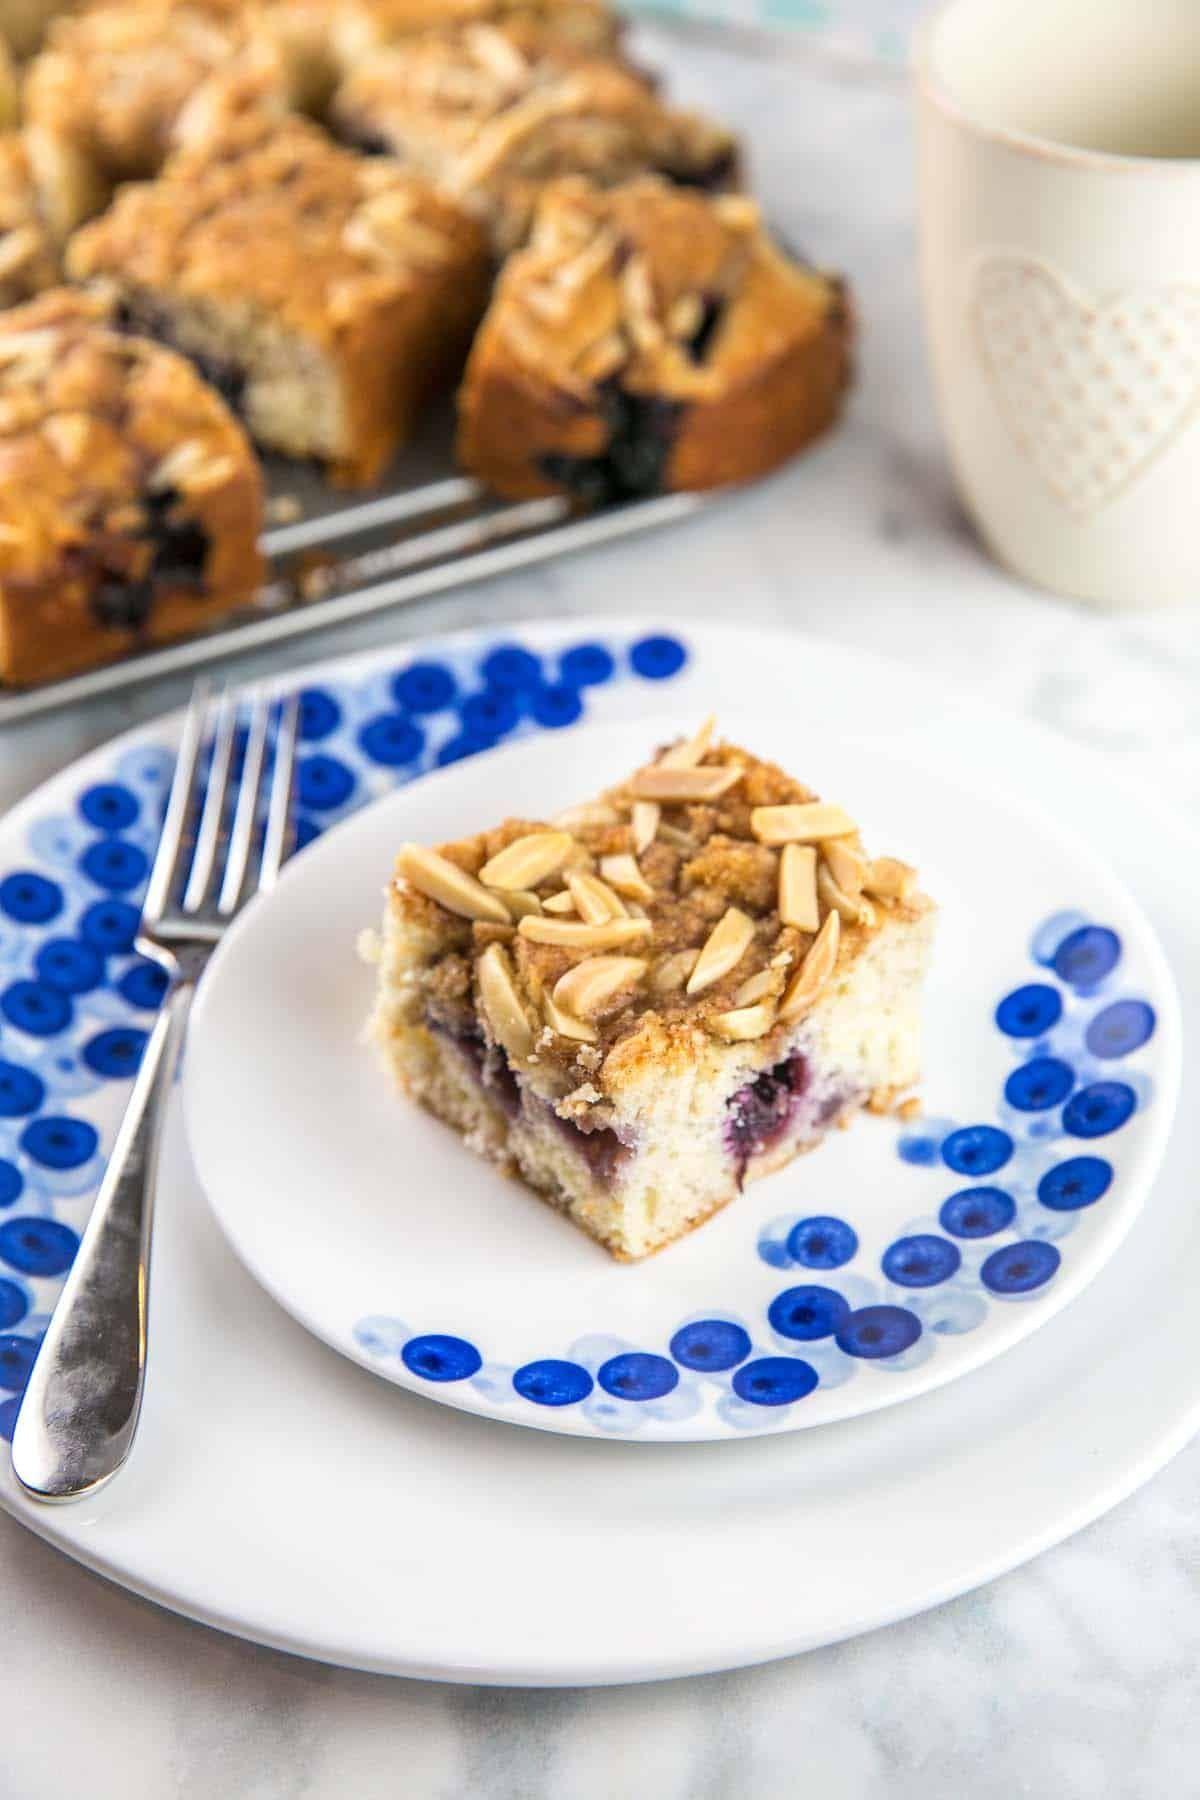 Almond Blueberry Breakfast Cake #buttermilkblueberrybreakfastcake Almond Blueberry Breakfast Cake: a light buttermilk blueberry cake with an almond streusel toping, perfect for breakfast or as as a not-so-sweet dessert. {Bunsen Burner Bakery} #breakfastcake #coffeecake #blueberrycake #buttermilkblueberrybreakfastcake